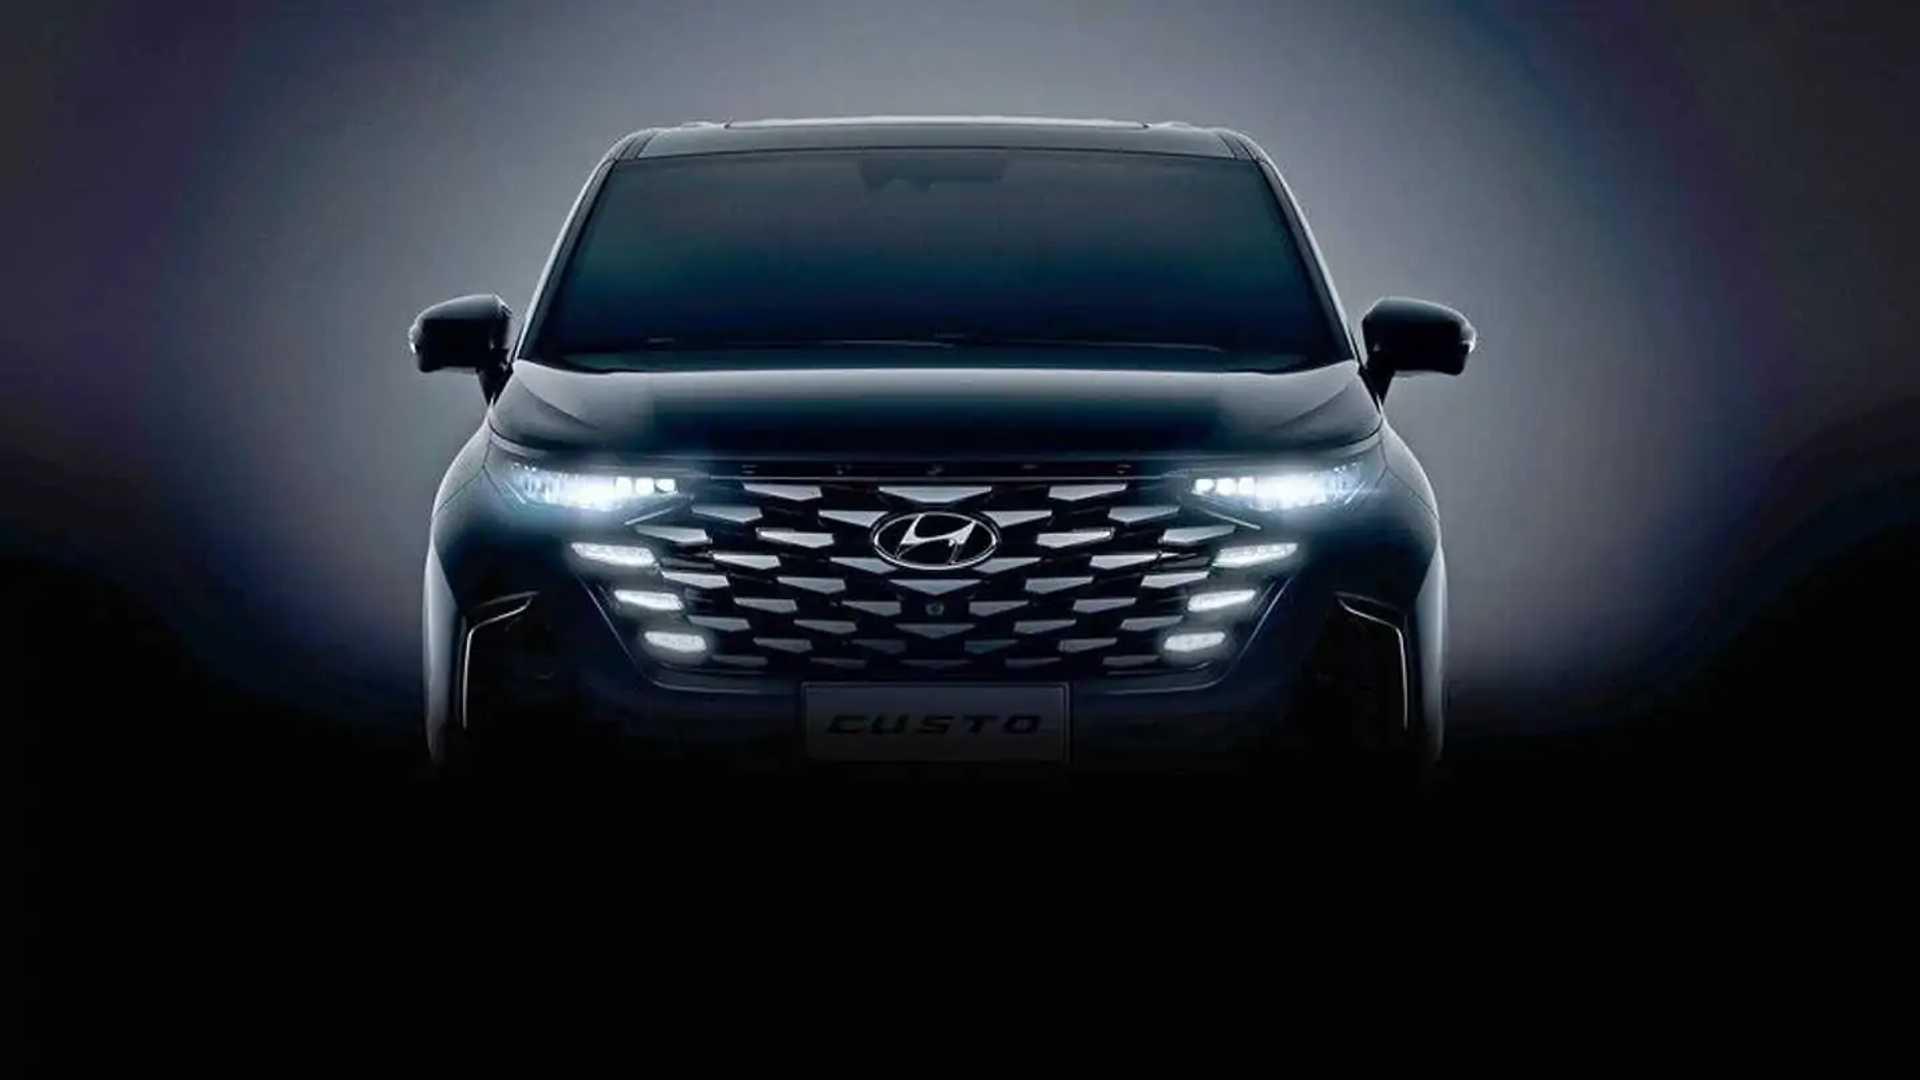 Teaser Hyundai Custo 2022